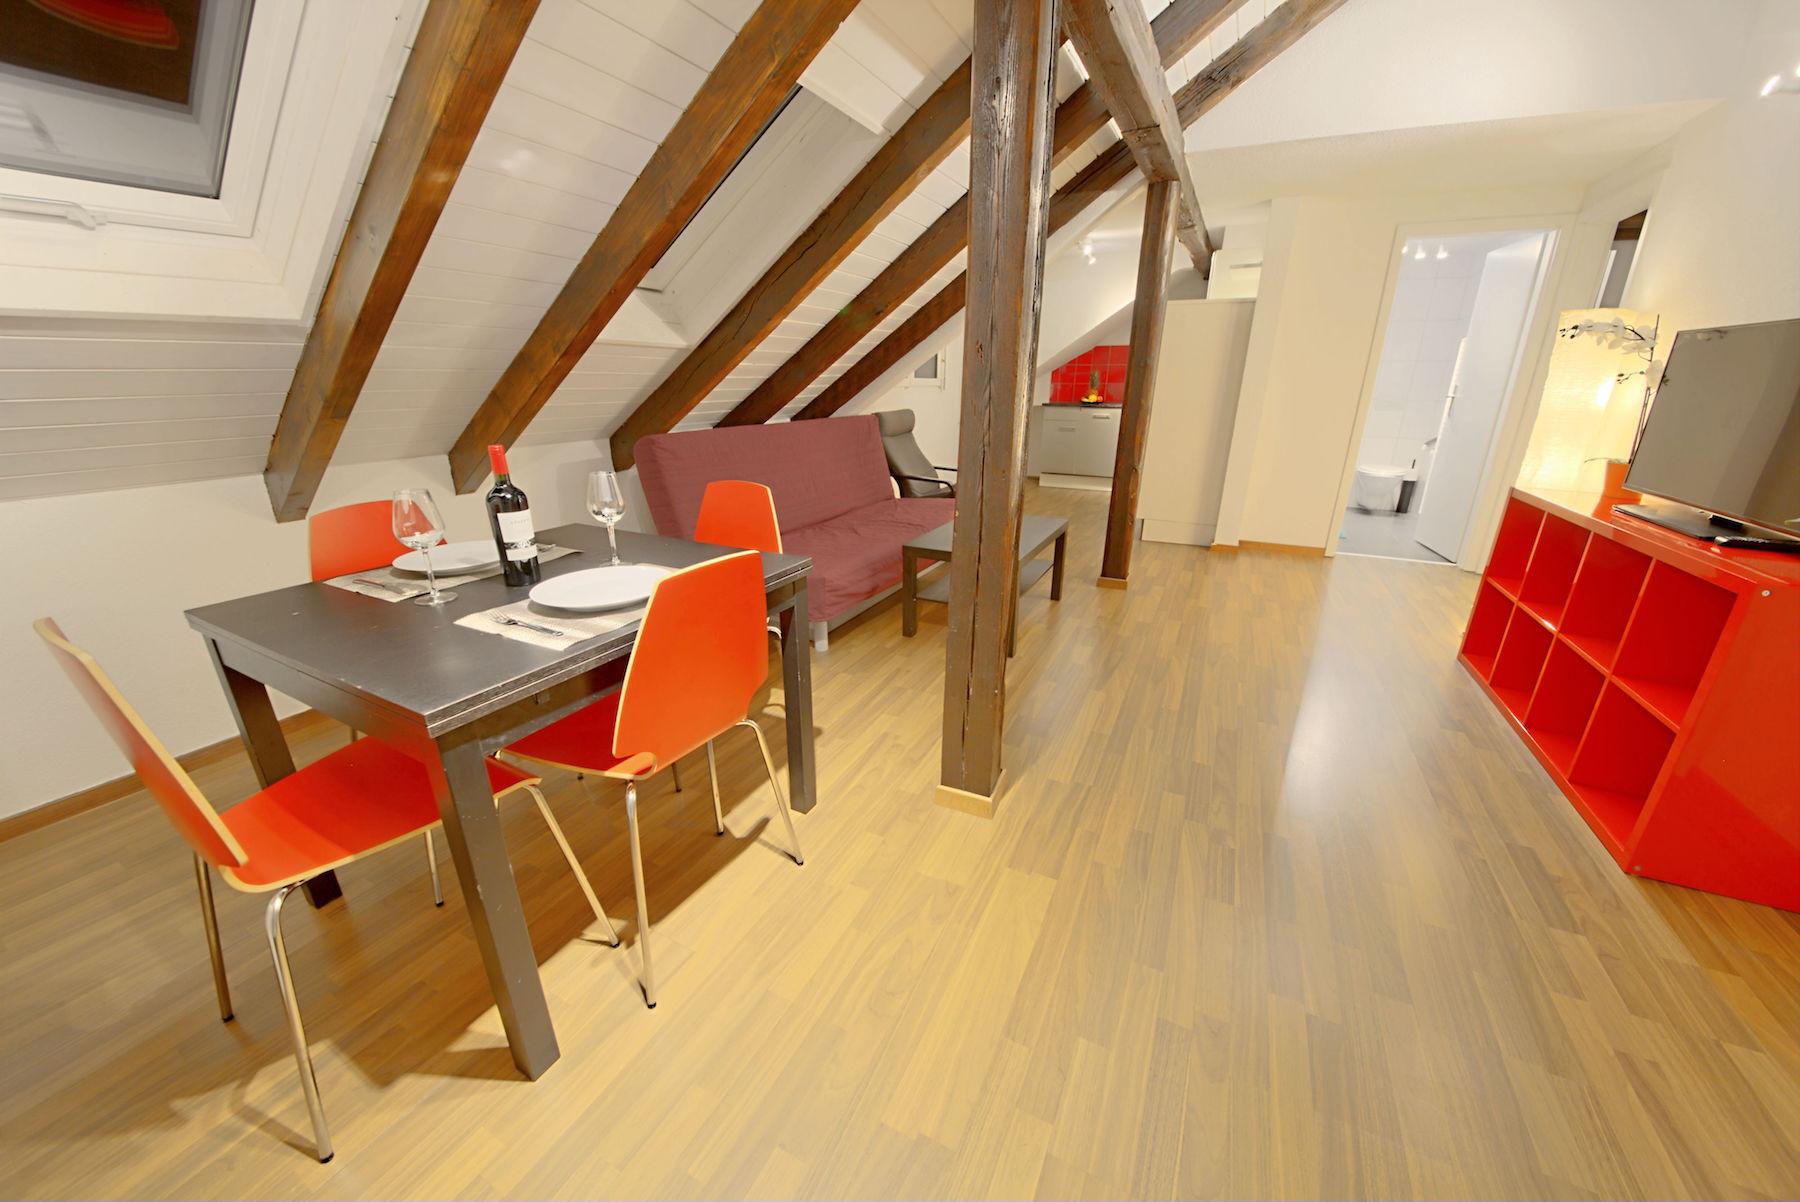 Superior Apartment in Zurich | Strawberry - Oerlikon HITrental